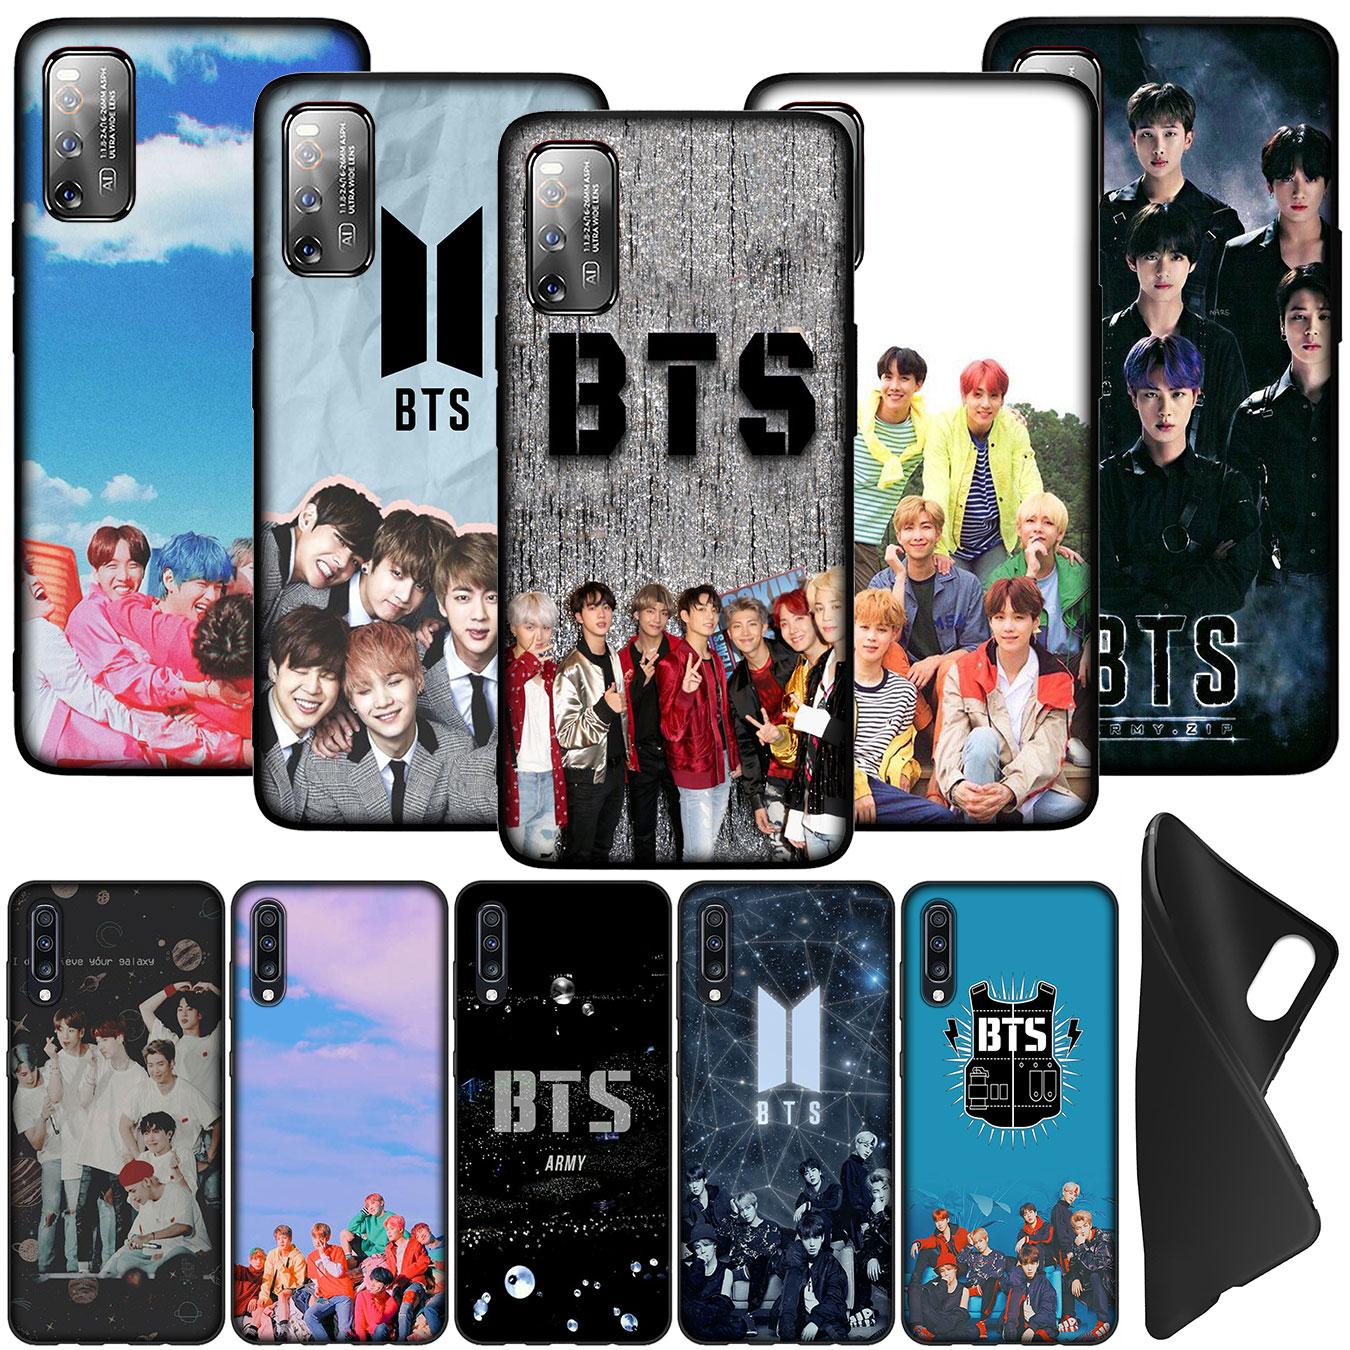 Soft Case Silikon Tpu Motif Bangtan Boys Bts Untuk Oppo A15 A15S A54 A94 A95 4g 5g